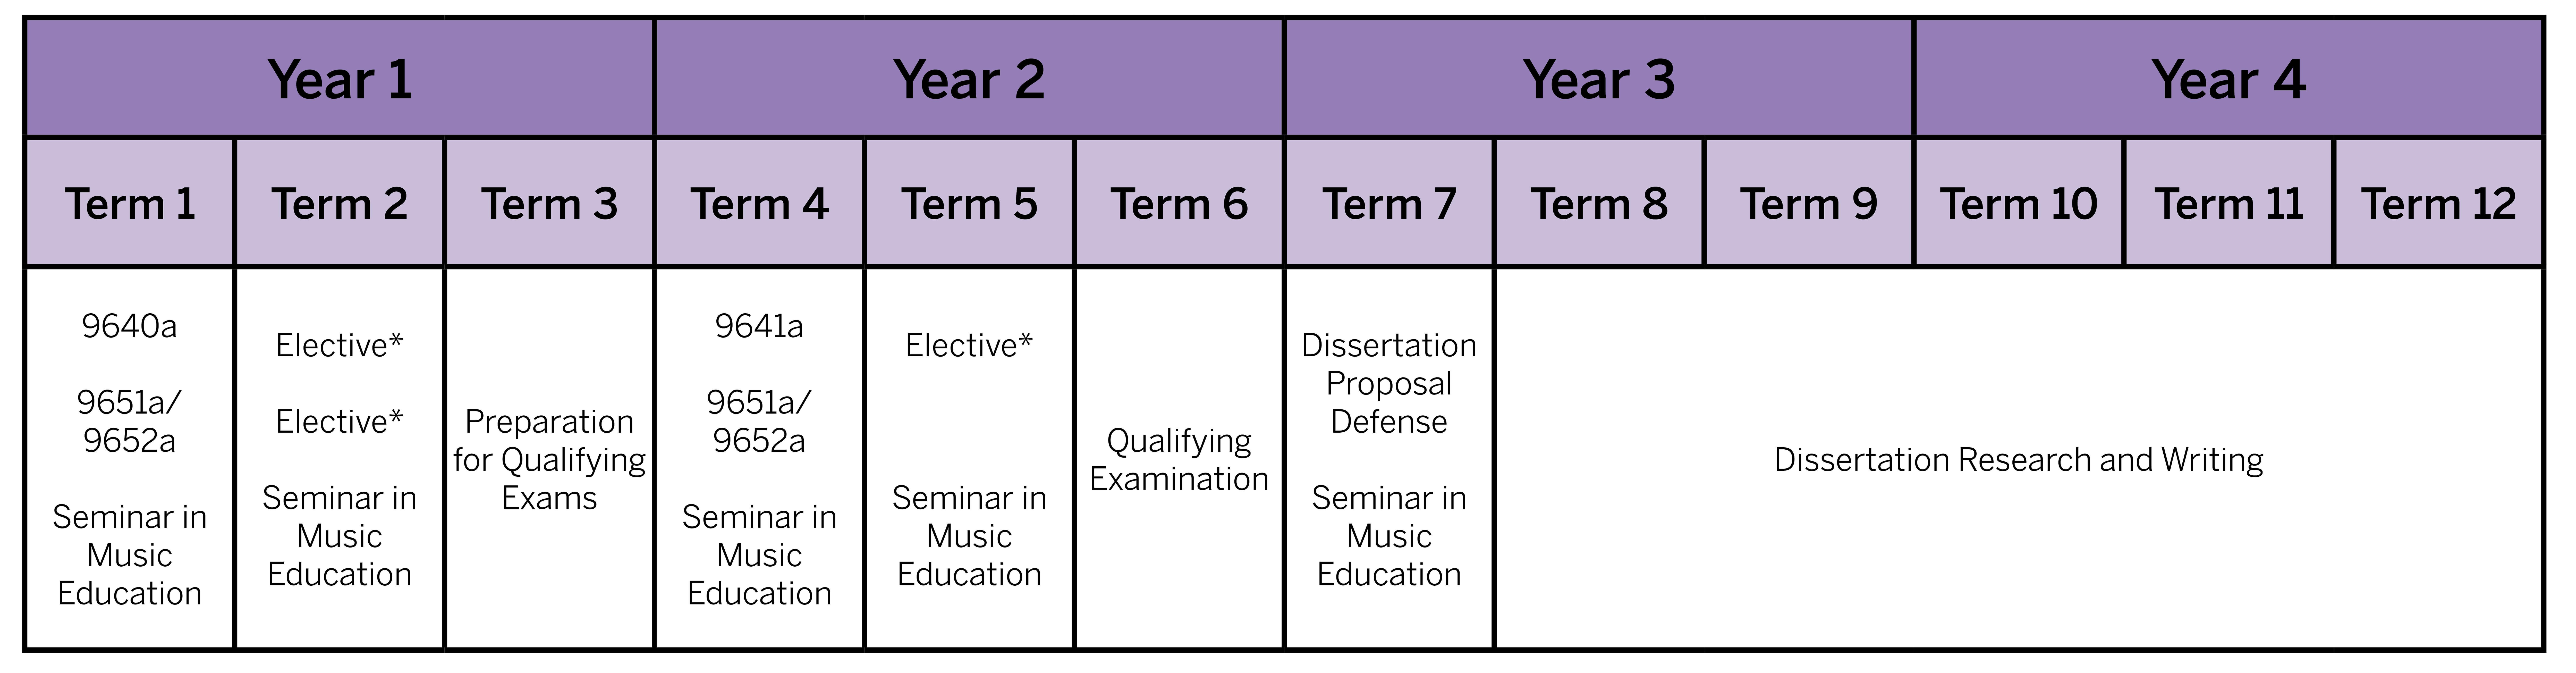 Training development phd thesis